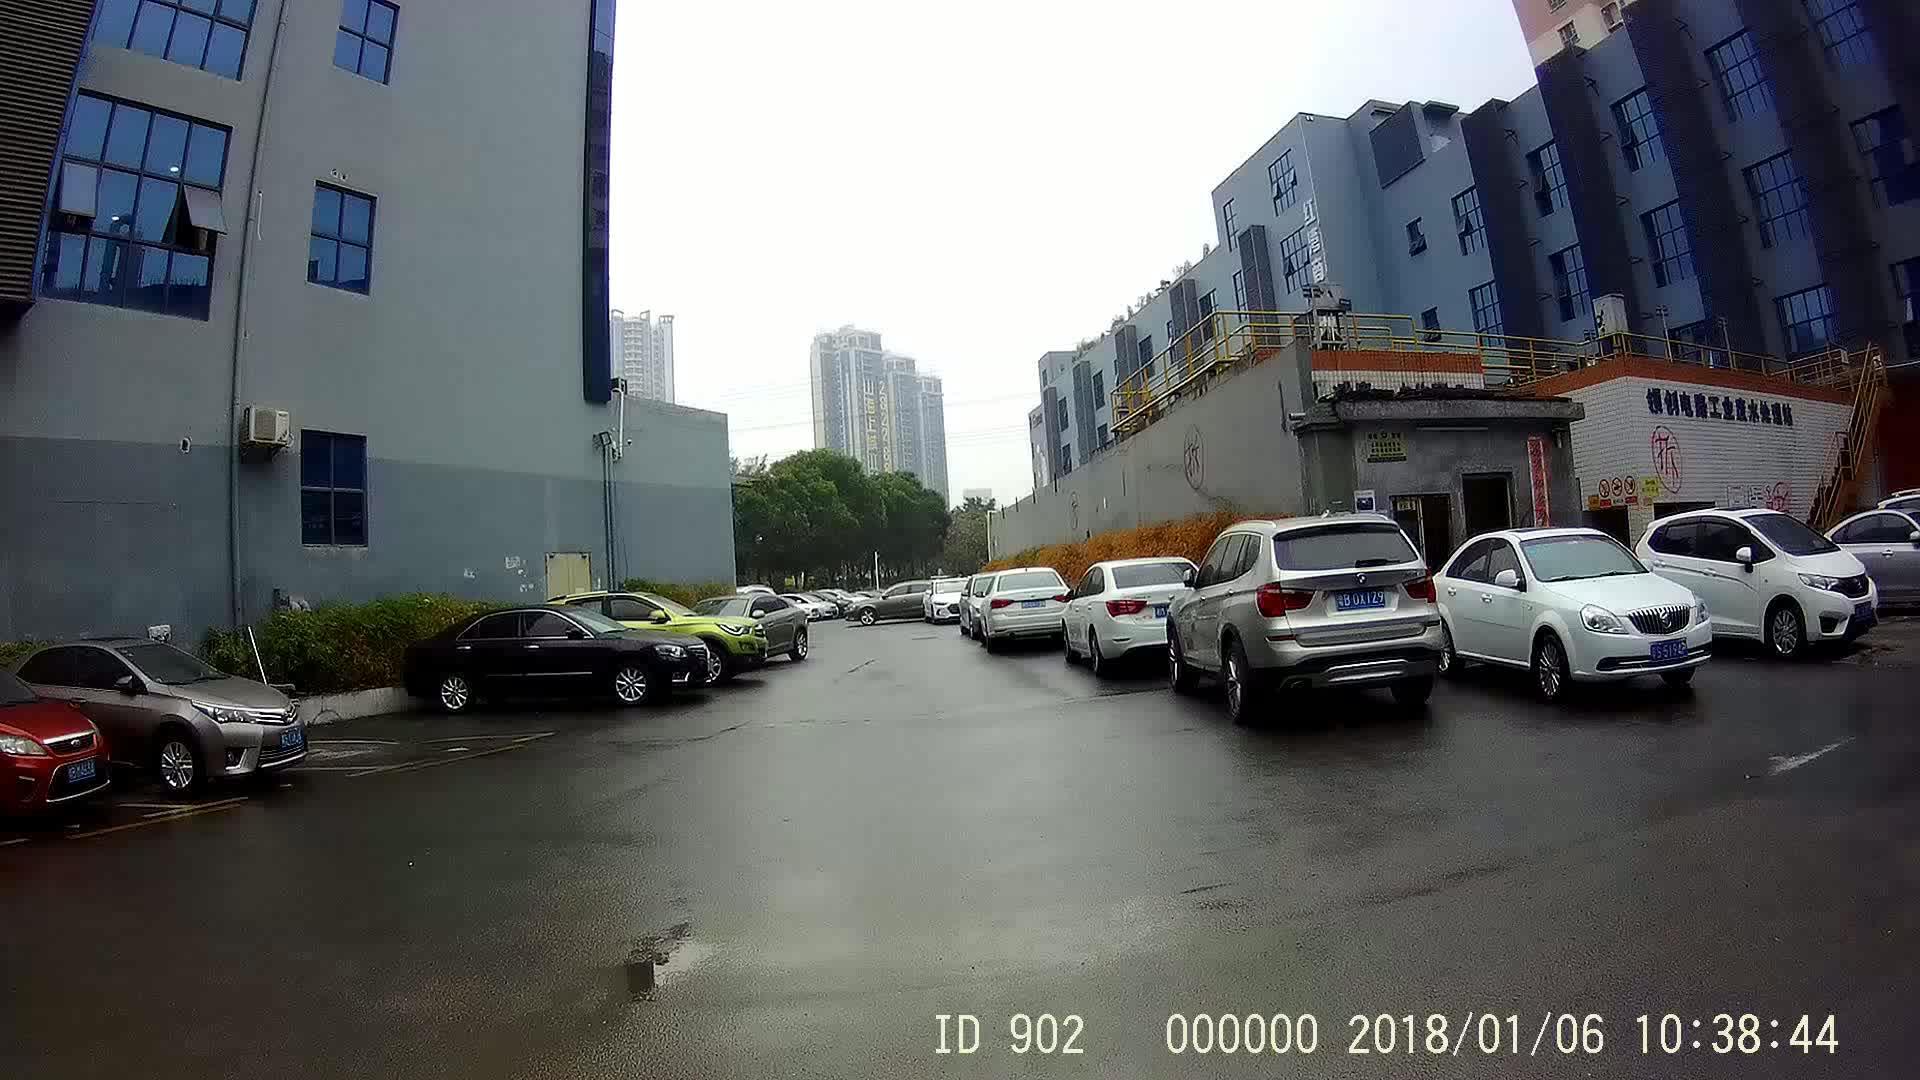 Shellfilm Hd 1080p Ir Police Night Vision 128gb Gps Body Worn Video Camera Waterproof Ip67 Digital Slr Buy Recording